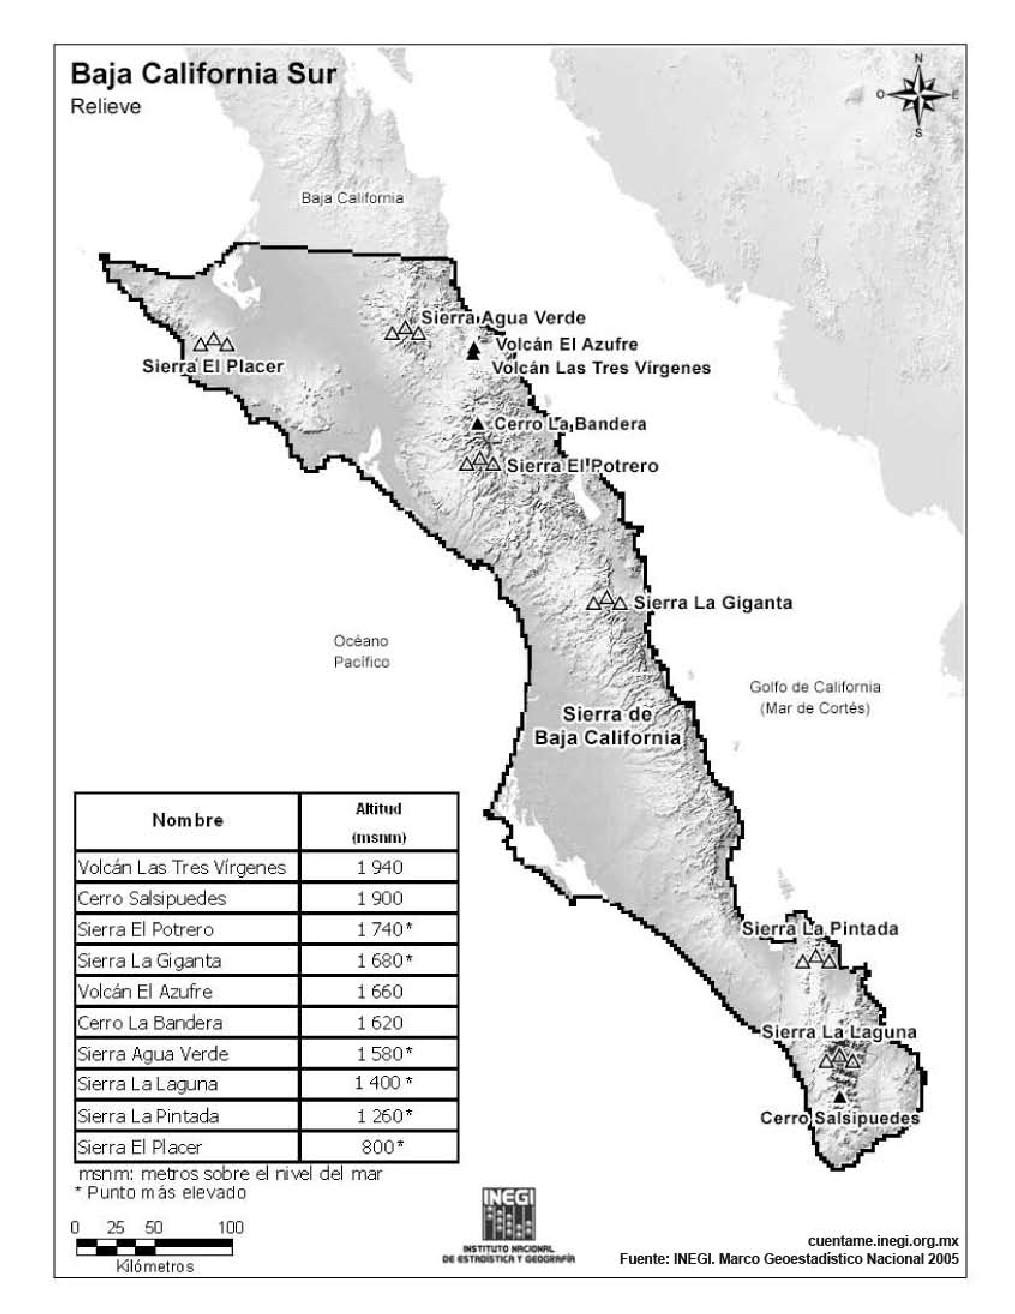 Mapa de montañas de Baja California Sur. INEGI de México